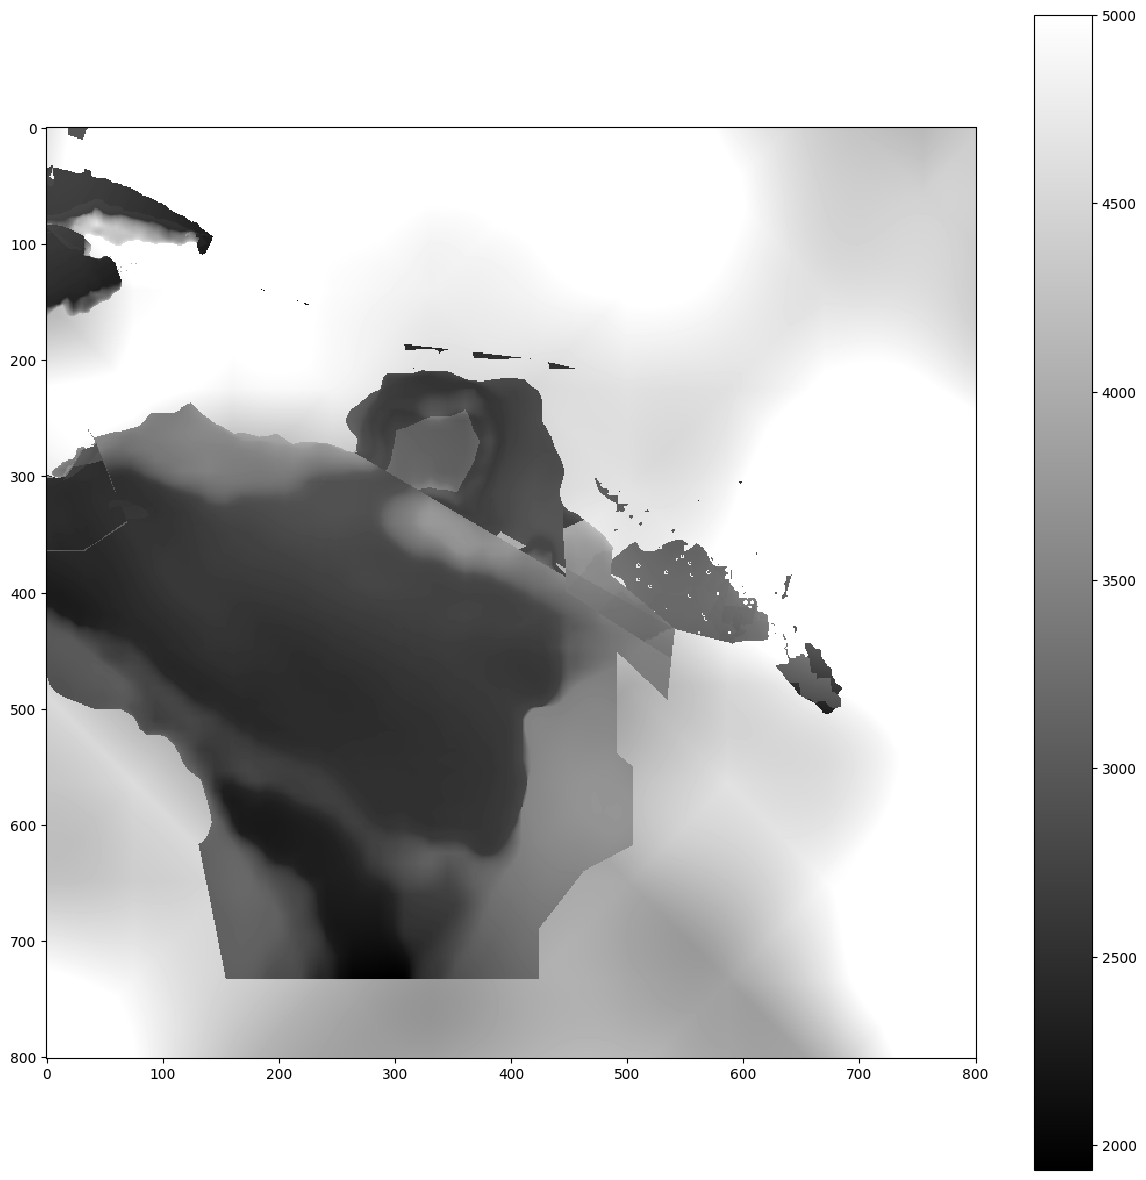 bench/seismic/wp/la_habra/meshes/velocity_model/plots/vp_1500.png